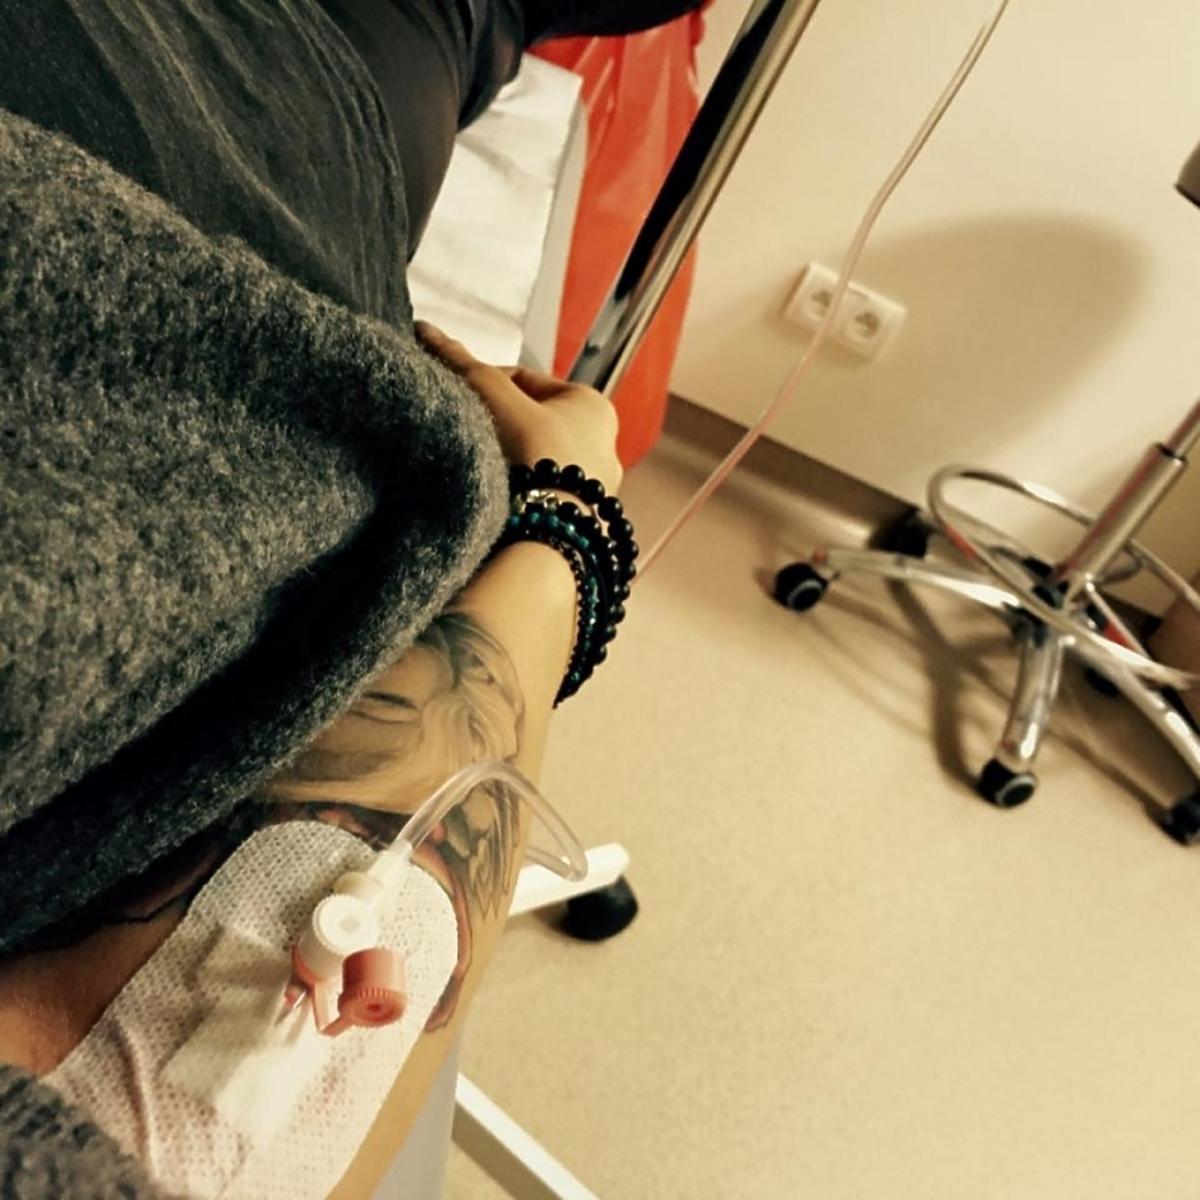 Maja Sablewska w szpitalu